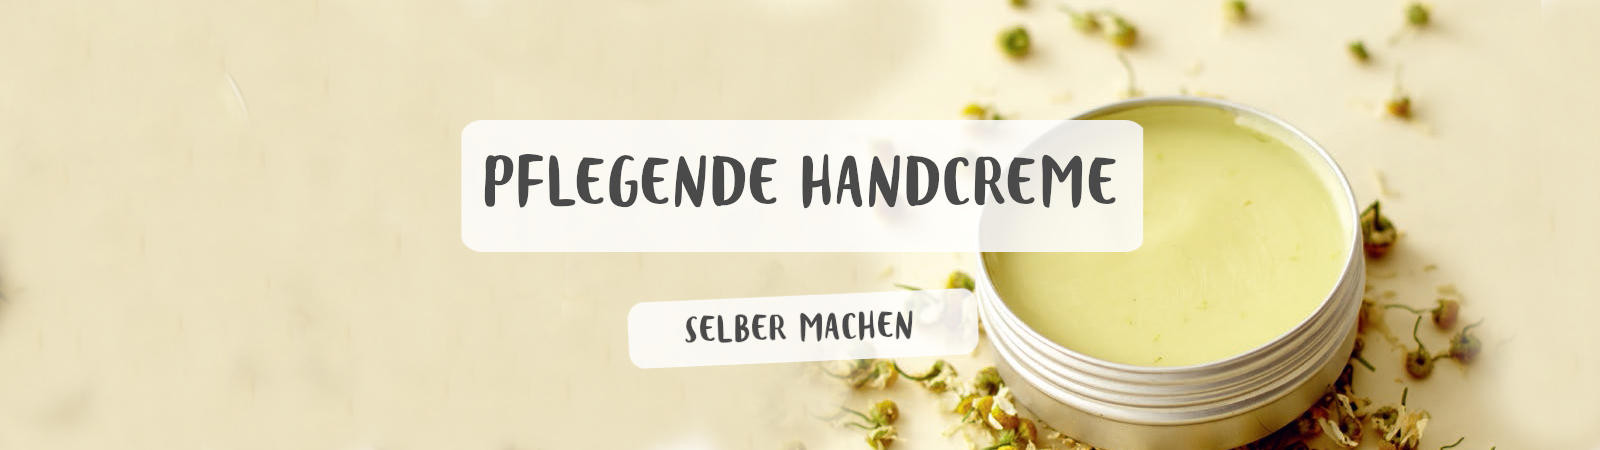 Handcreme_Banner_1600x450